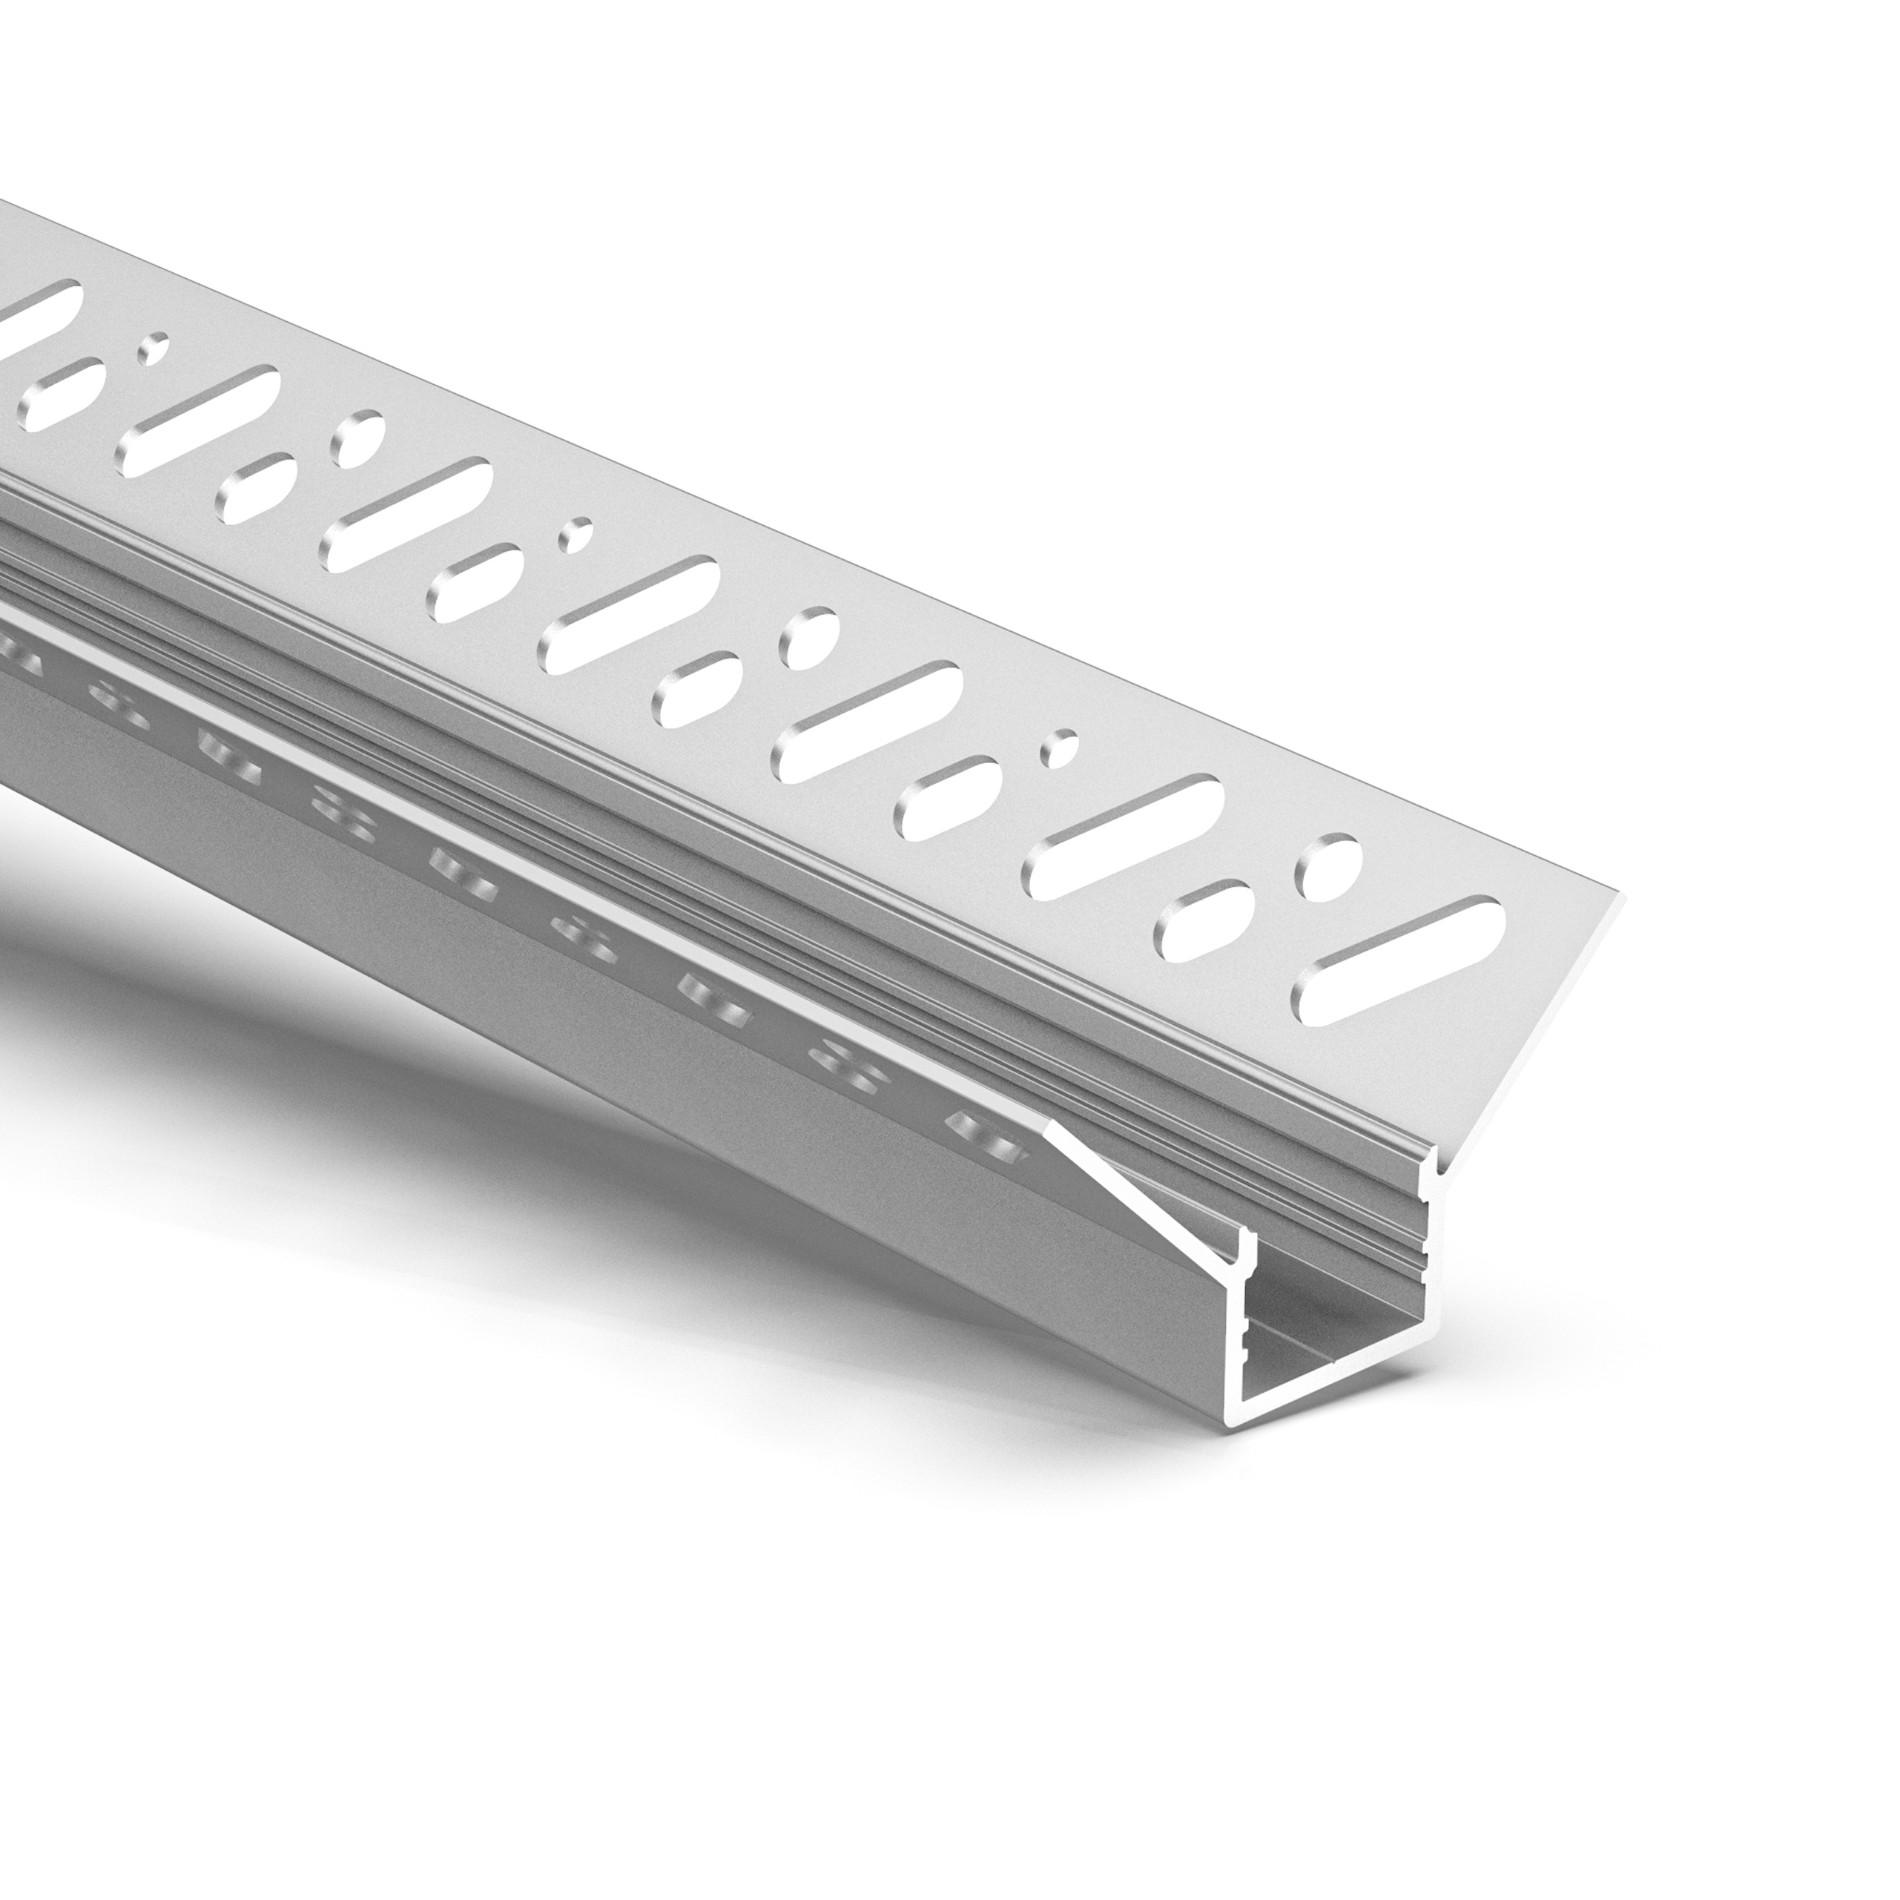 CT6 Trimless Aluminium Extrusions for recessing into plasterboard inside corner 49.8x26.2mm